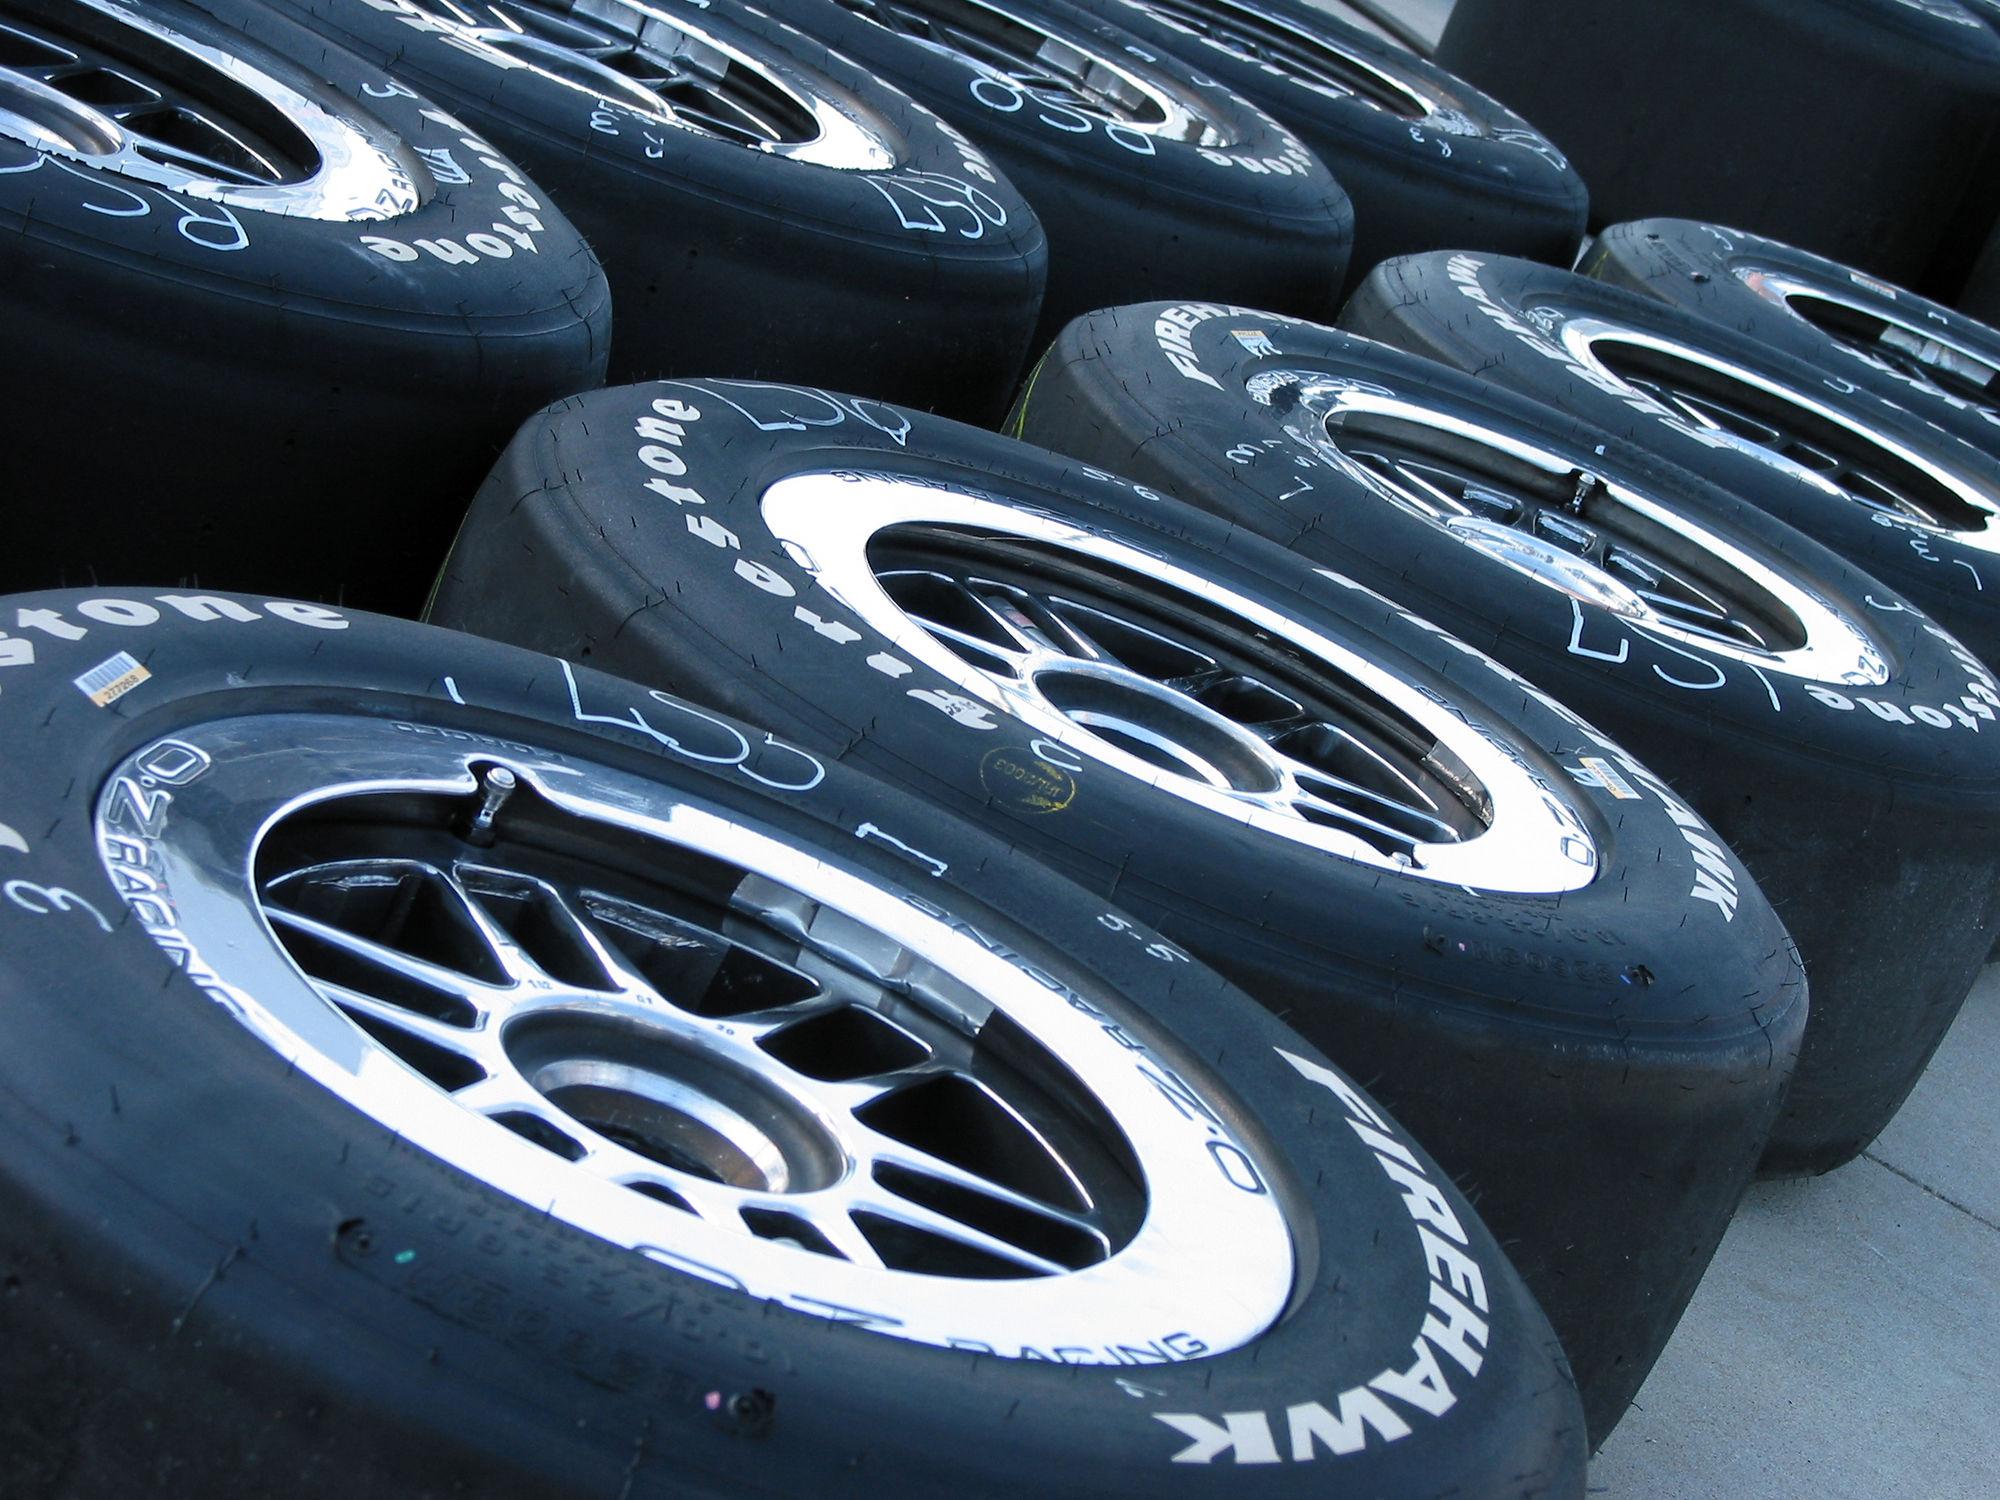 Foto 4 de Neumáticos en Reus | Pneumàtics Romero